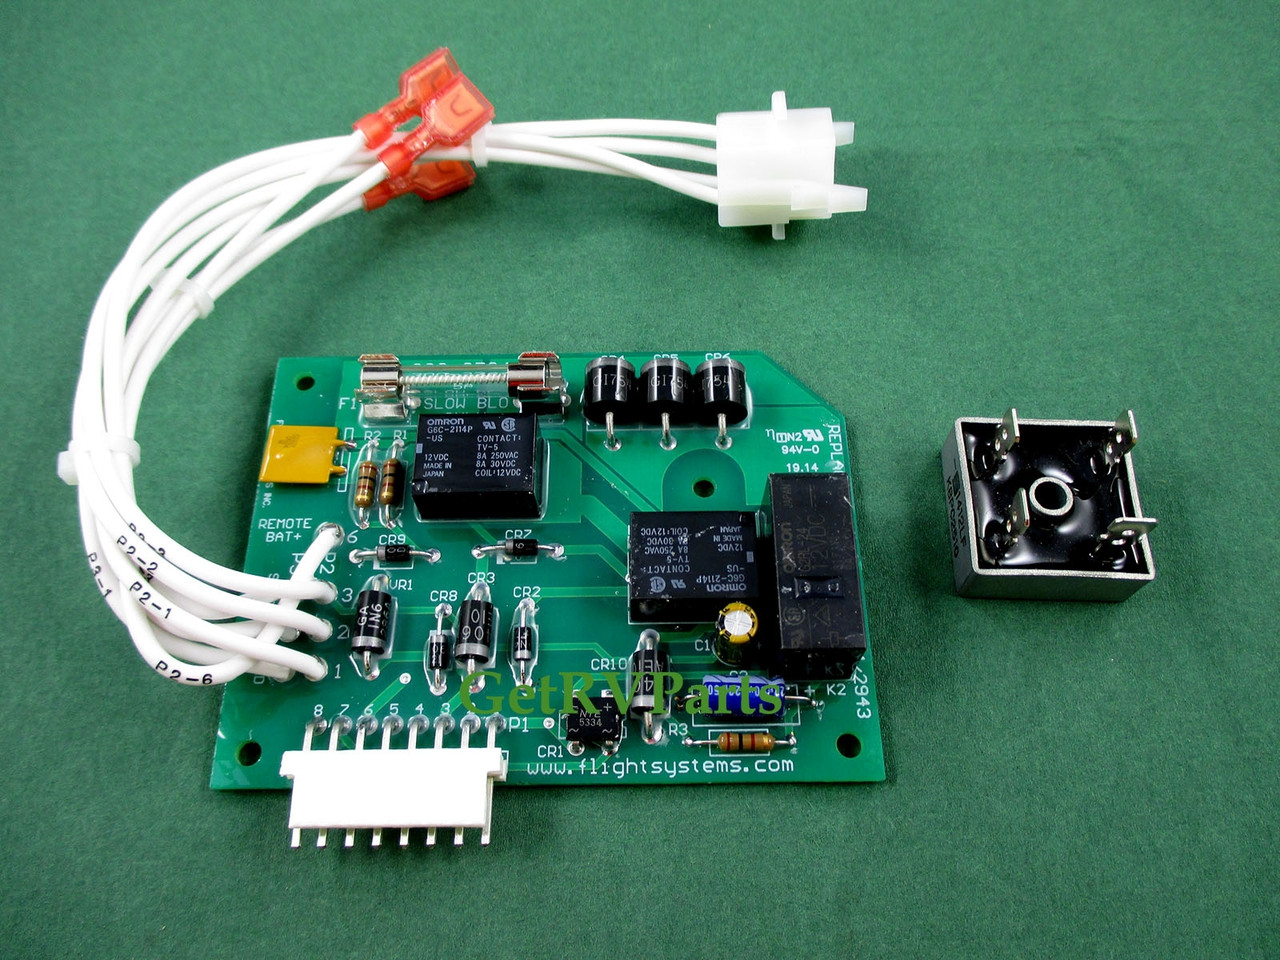 Onan Aftermarket 300-2784 Generator Circuit Board Flight System